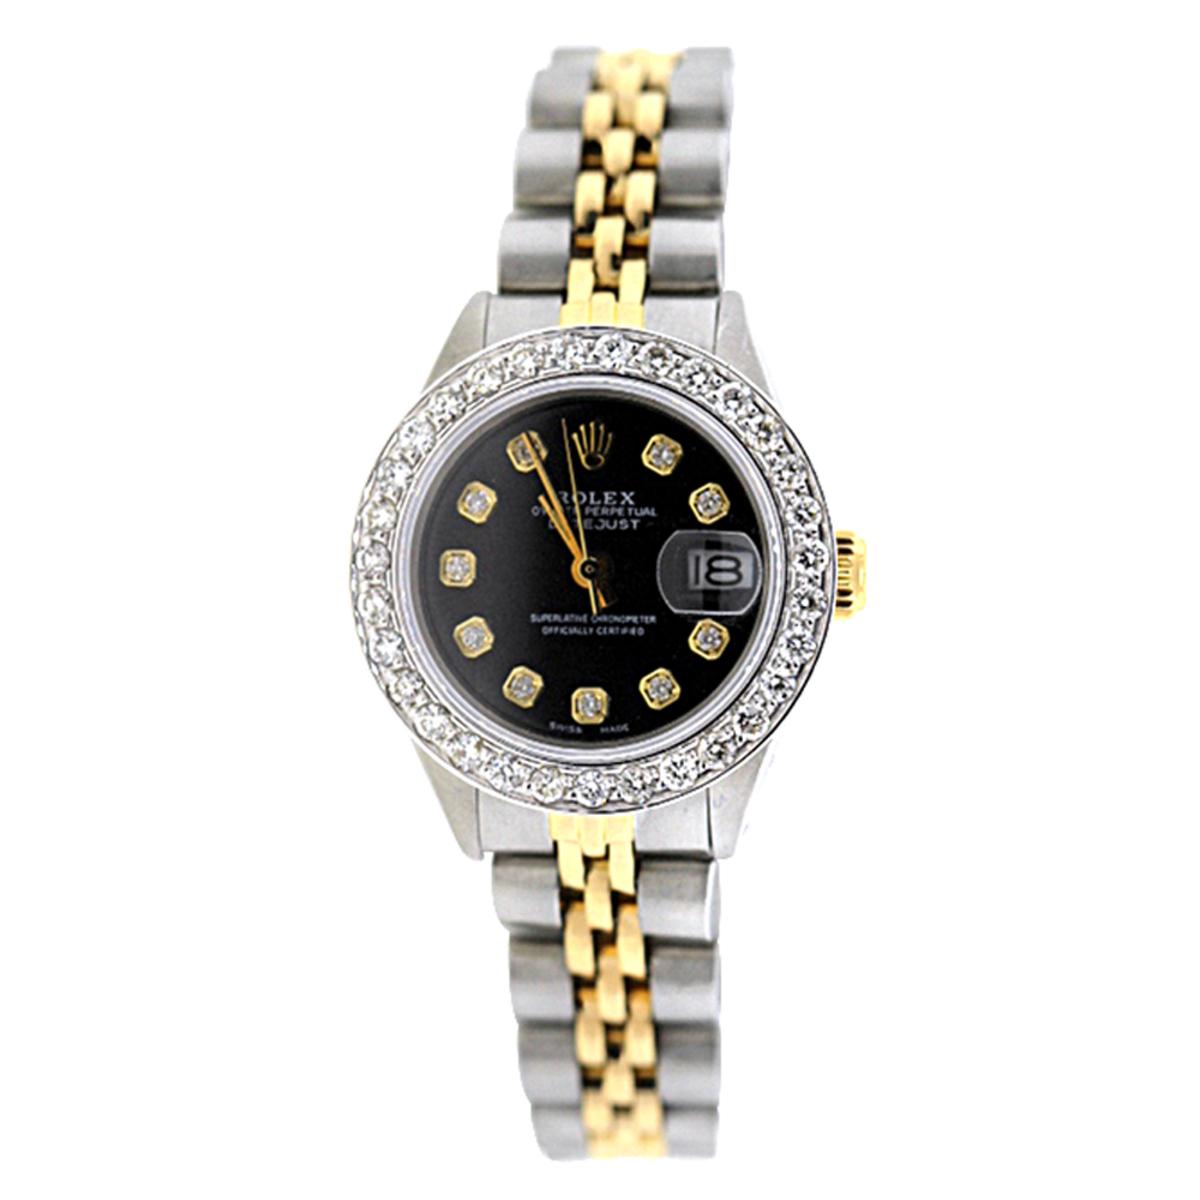 Rolex Datejust Ladies Diamond Bezel Watch 1.5ct